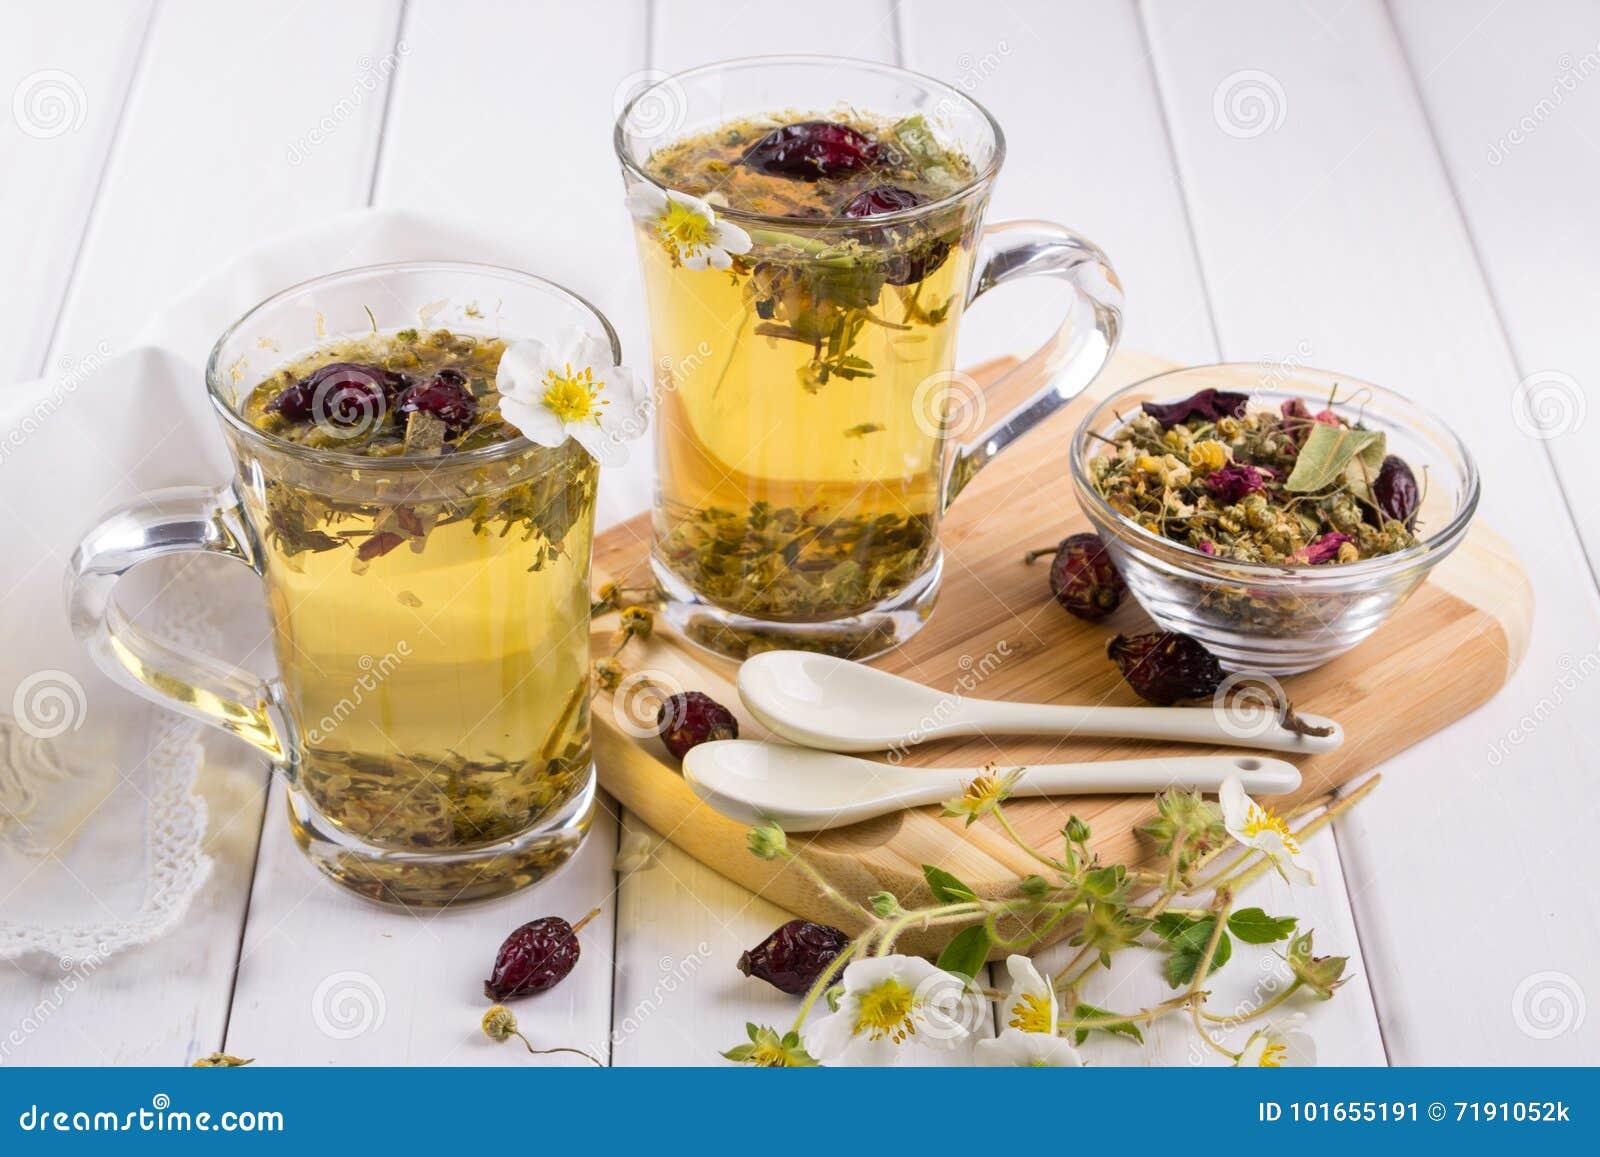 Is tea useful? 46